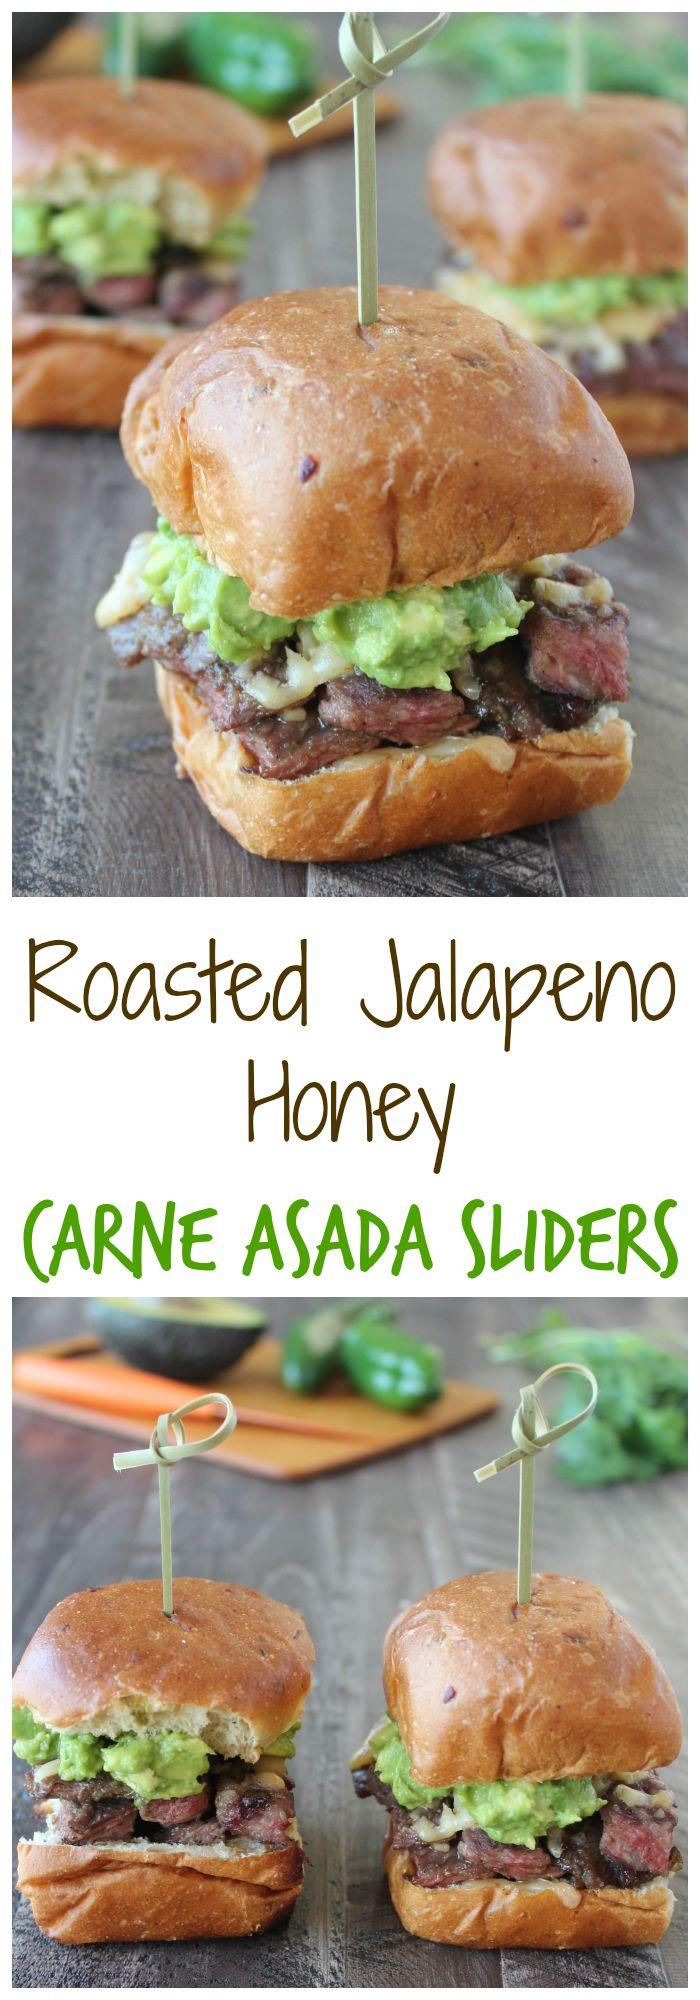 Roasted Jalapeño Honey Grilled Carne Asada + Melty Spicy Cheese + Fresh Guacamole + King's Hawaiian Jalapeño Rolls = Best Sliders Ever!